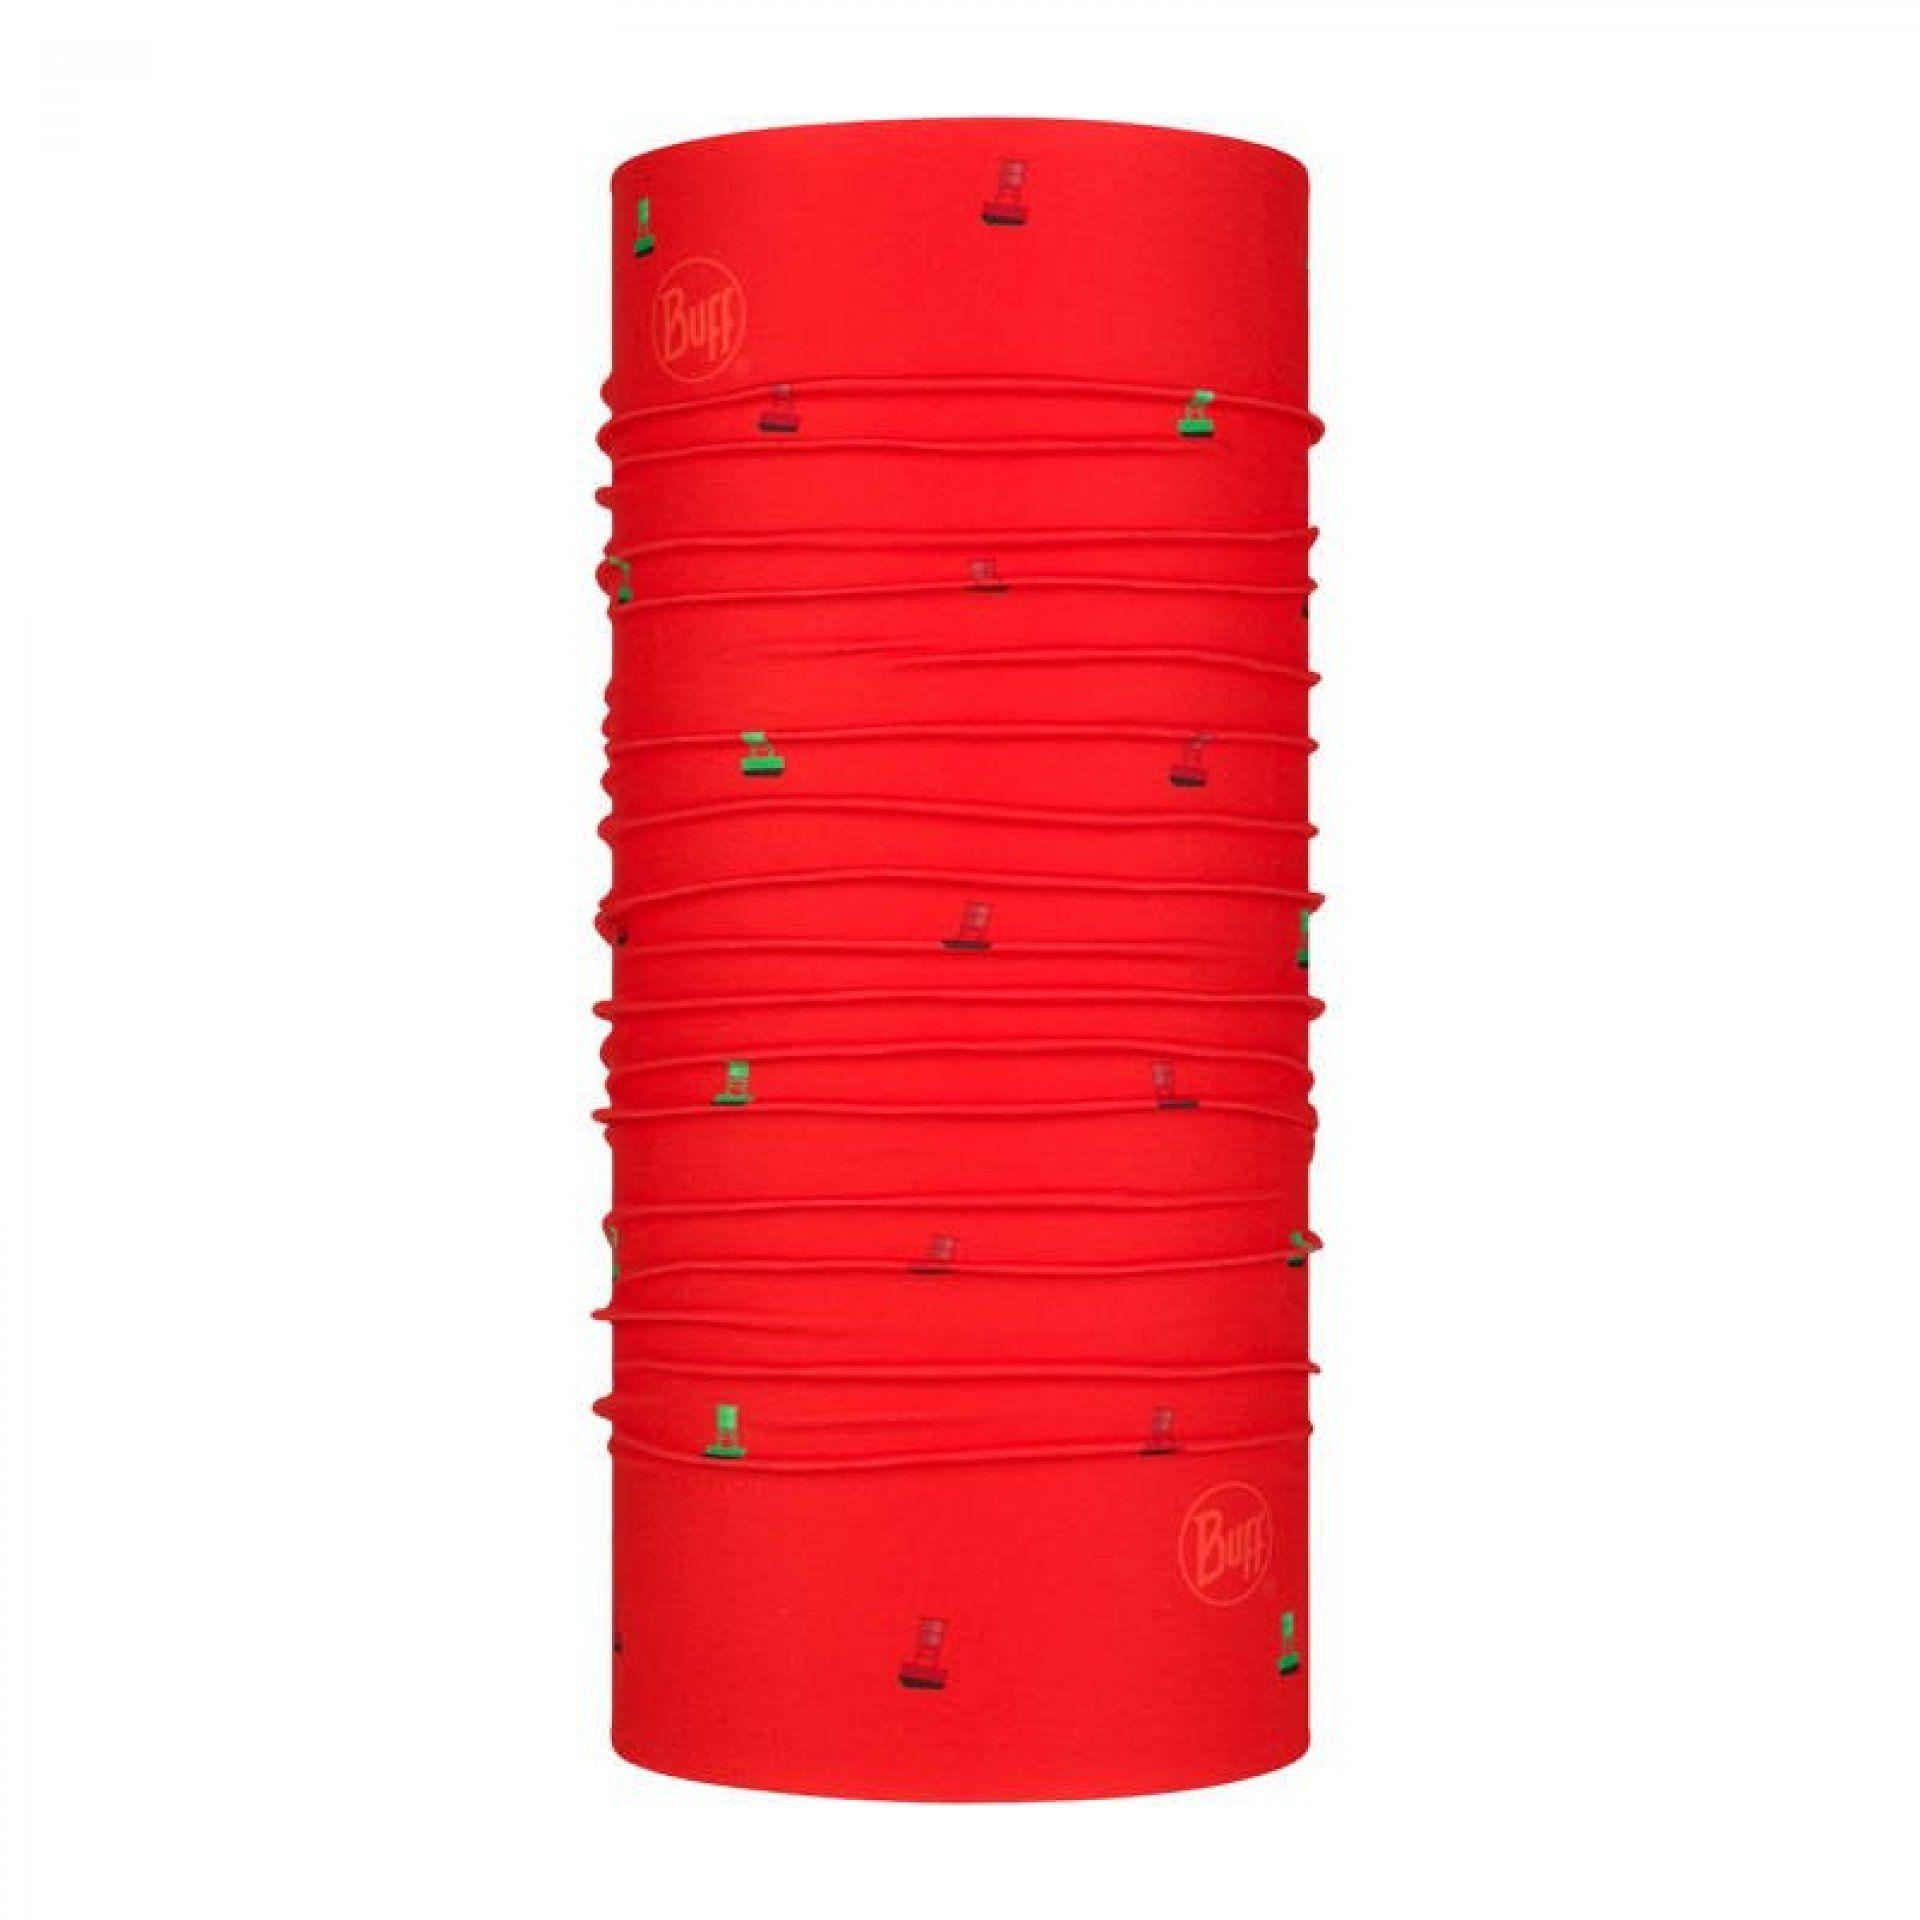 CHUSTA BUFF ORIGINAL NAUTICAL CHANNELS RED